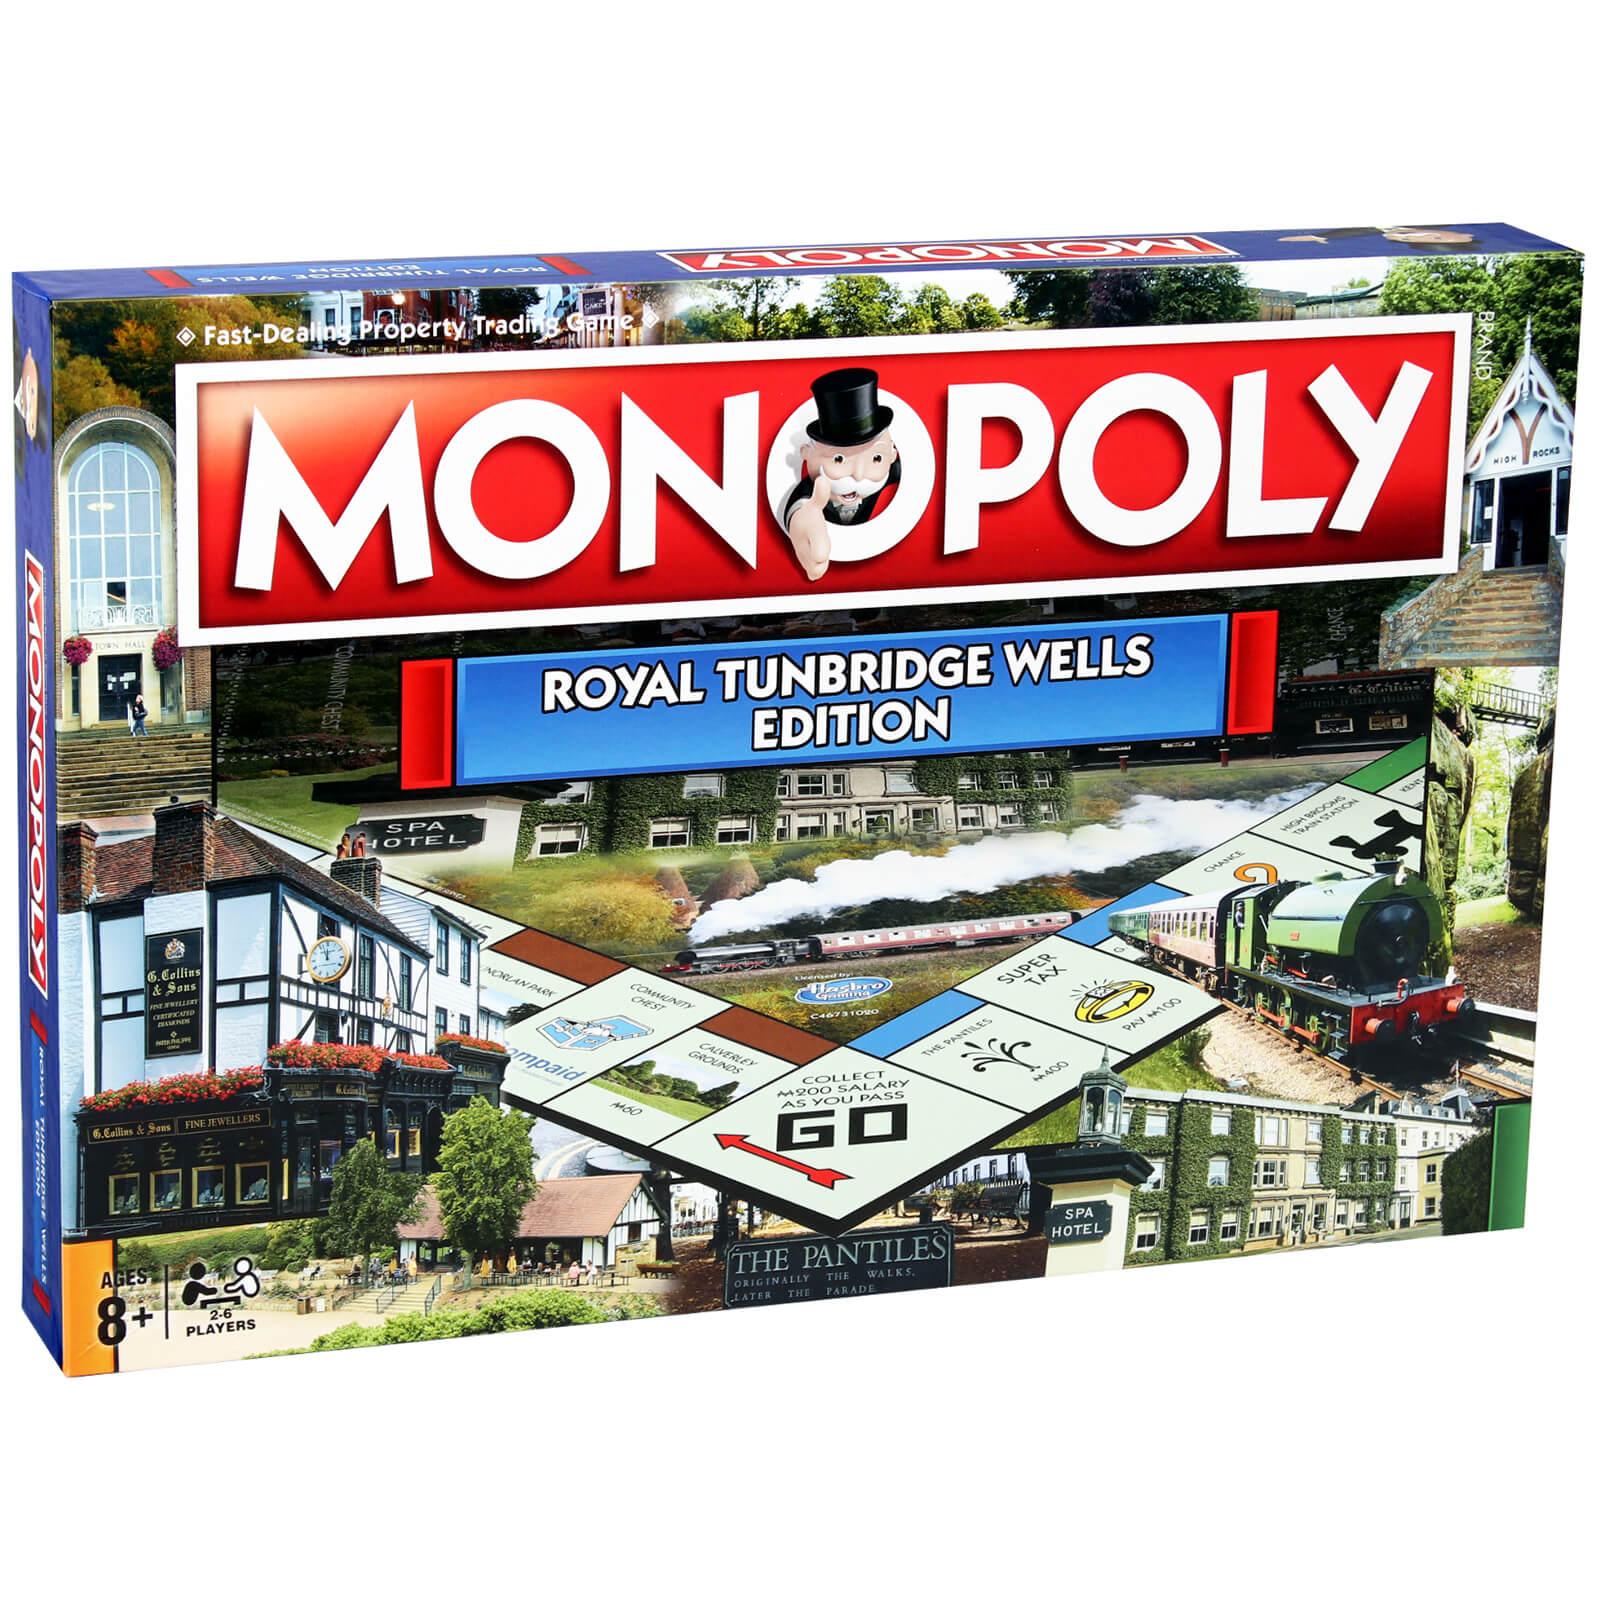 Image of Monopoly Board Game - Tunbridge Wells Edition